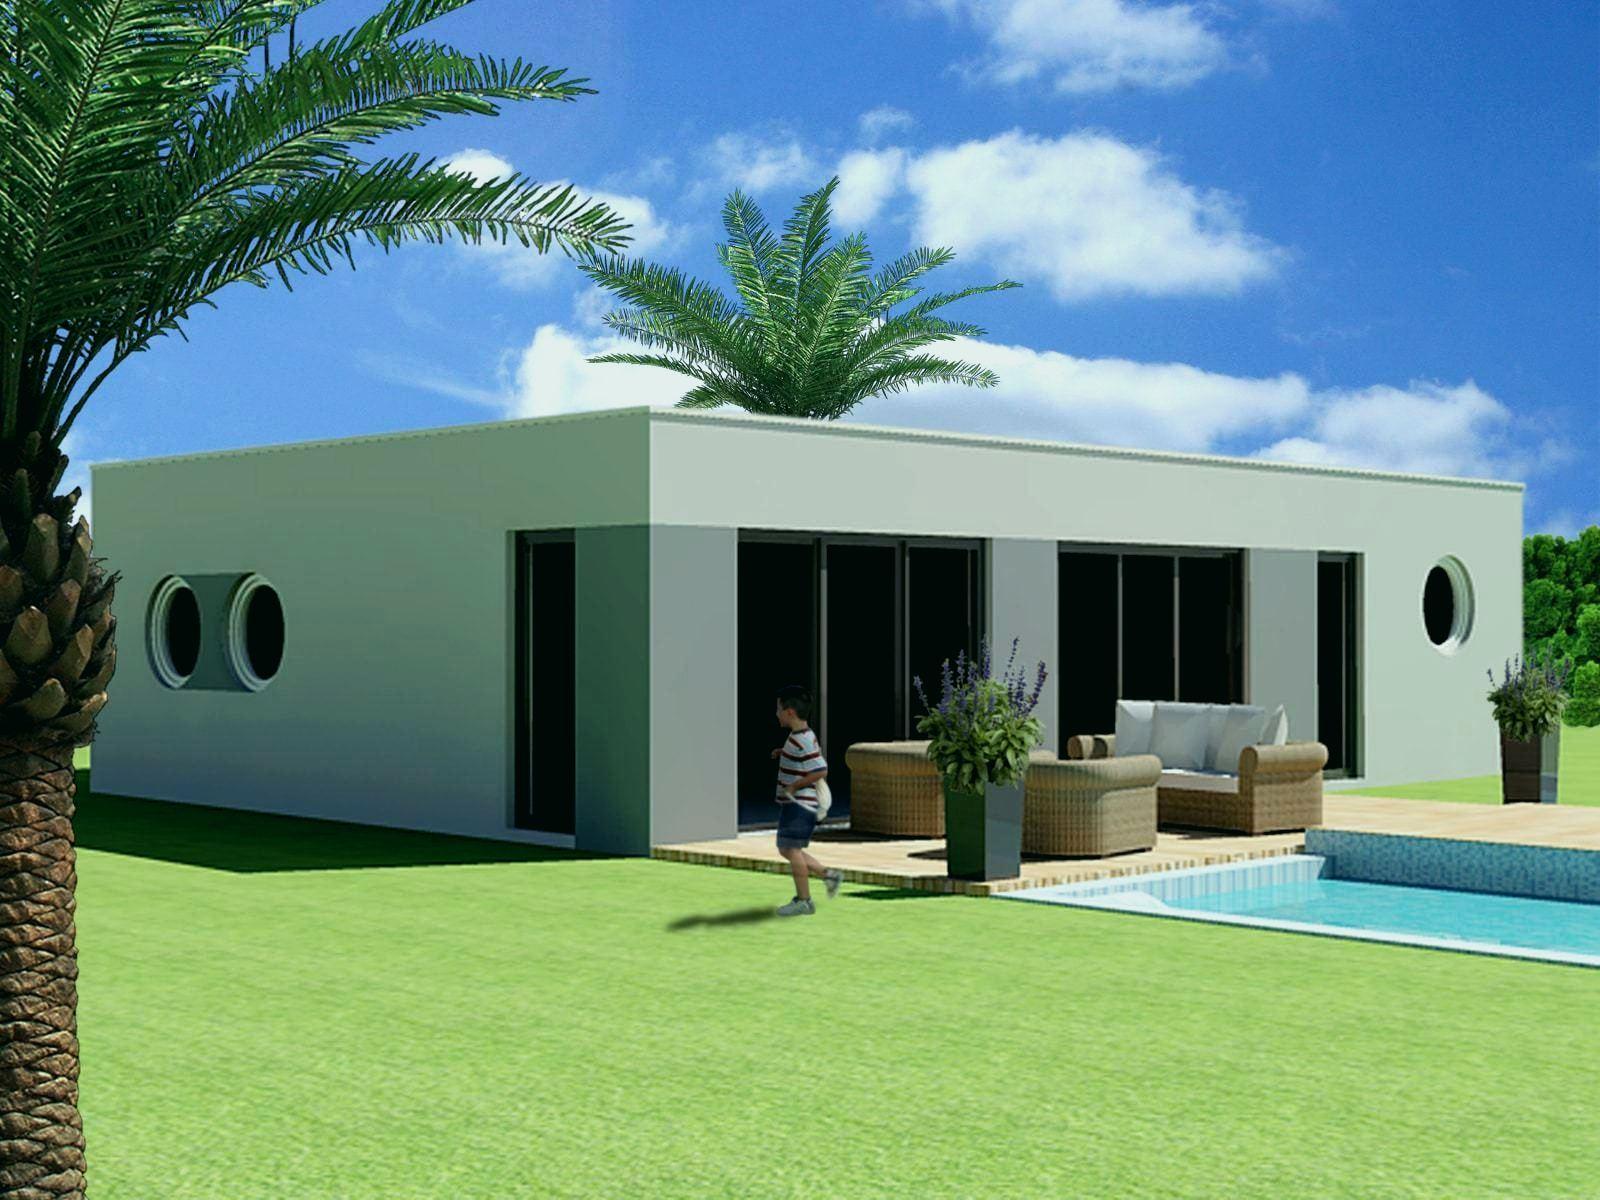 Minecraft Deco Moderne Impressionnant Image Meilleurs Maison Moderne En Bois